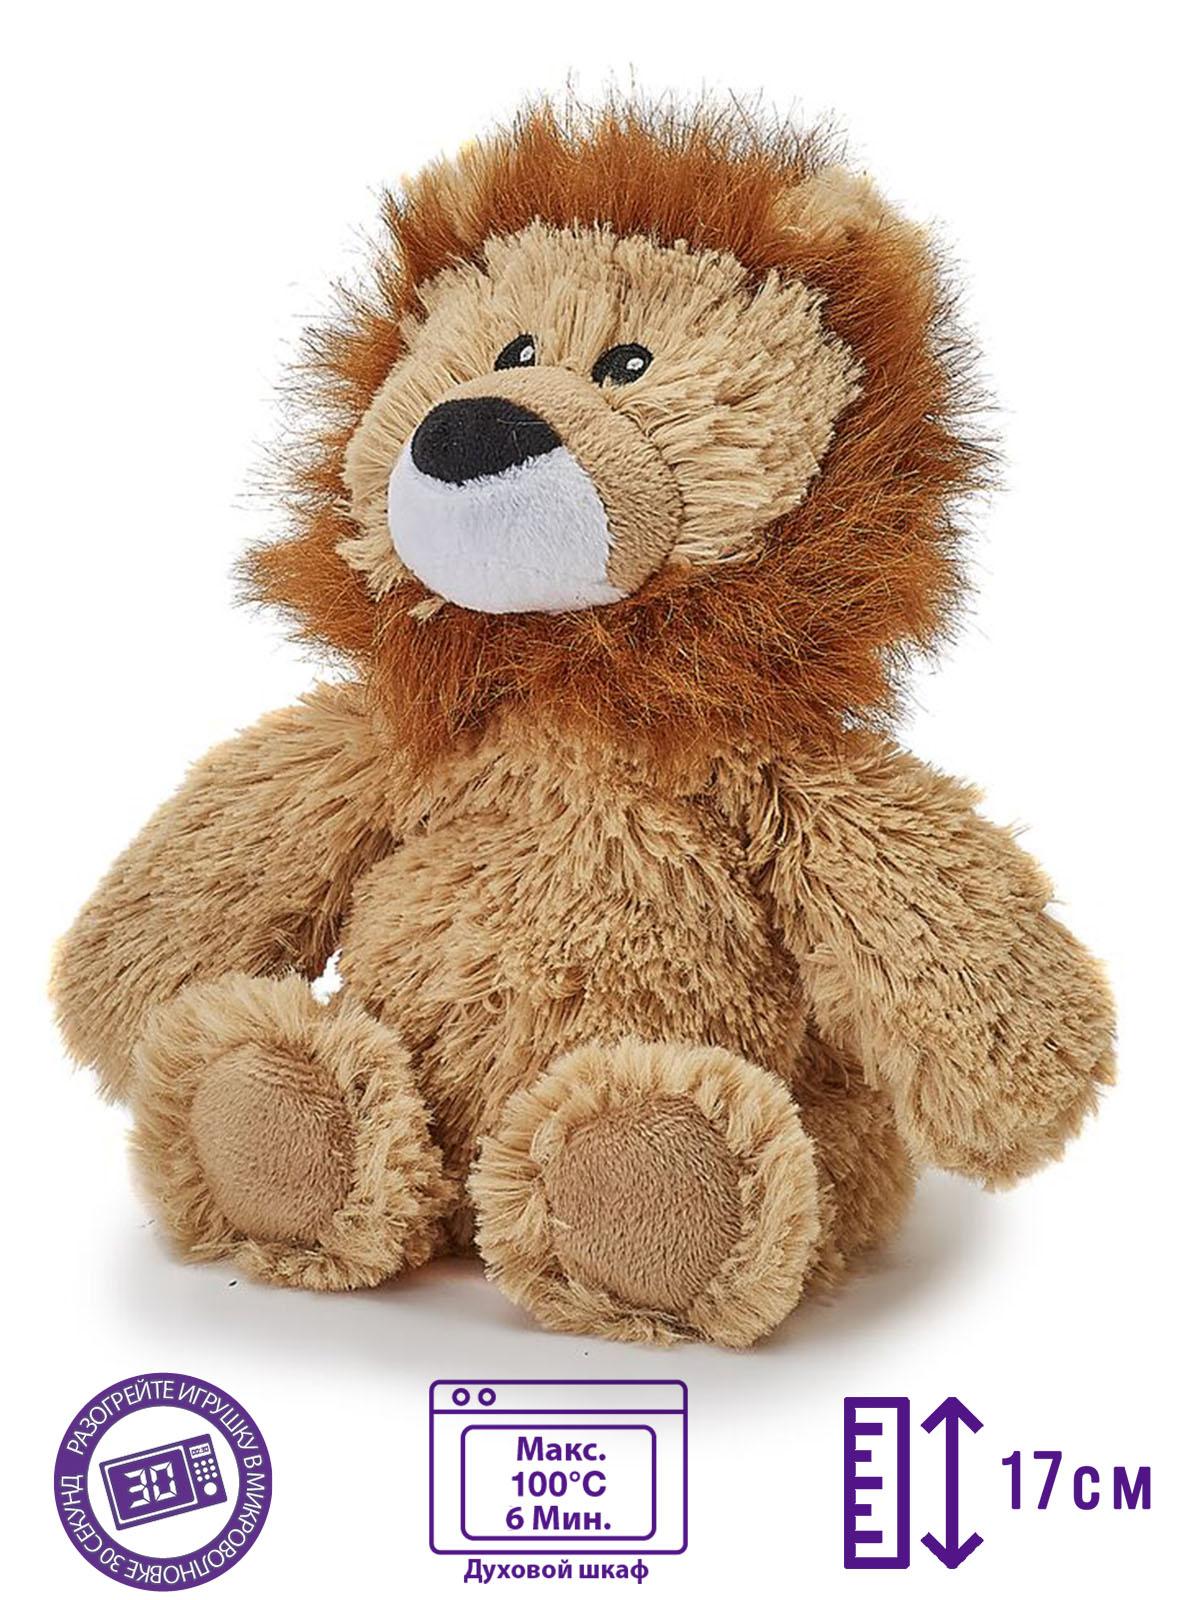 Пинкл (Pinkl) | Игрушка-грелка Junior Львенок | Intelex Warmies Cozy Plush Junior Lion